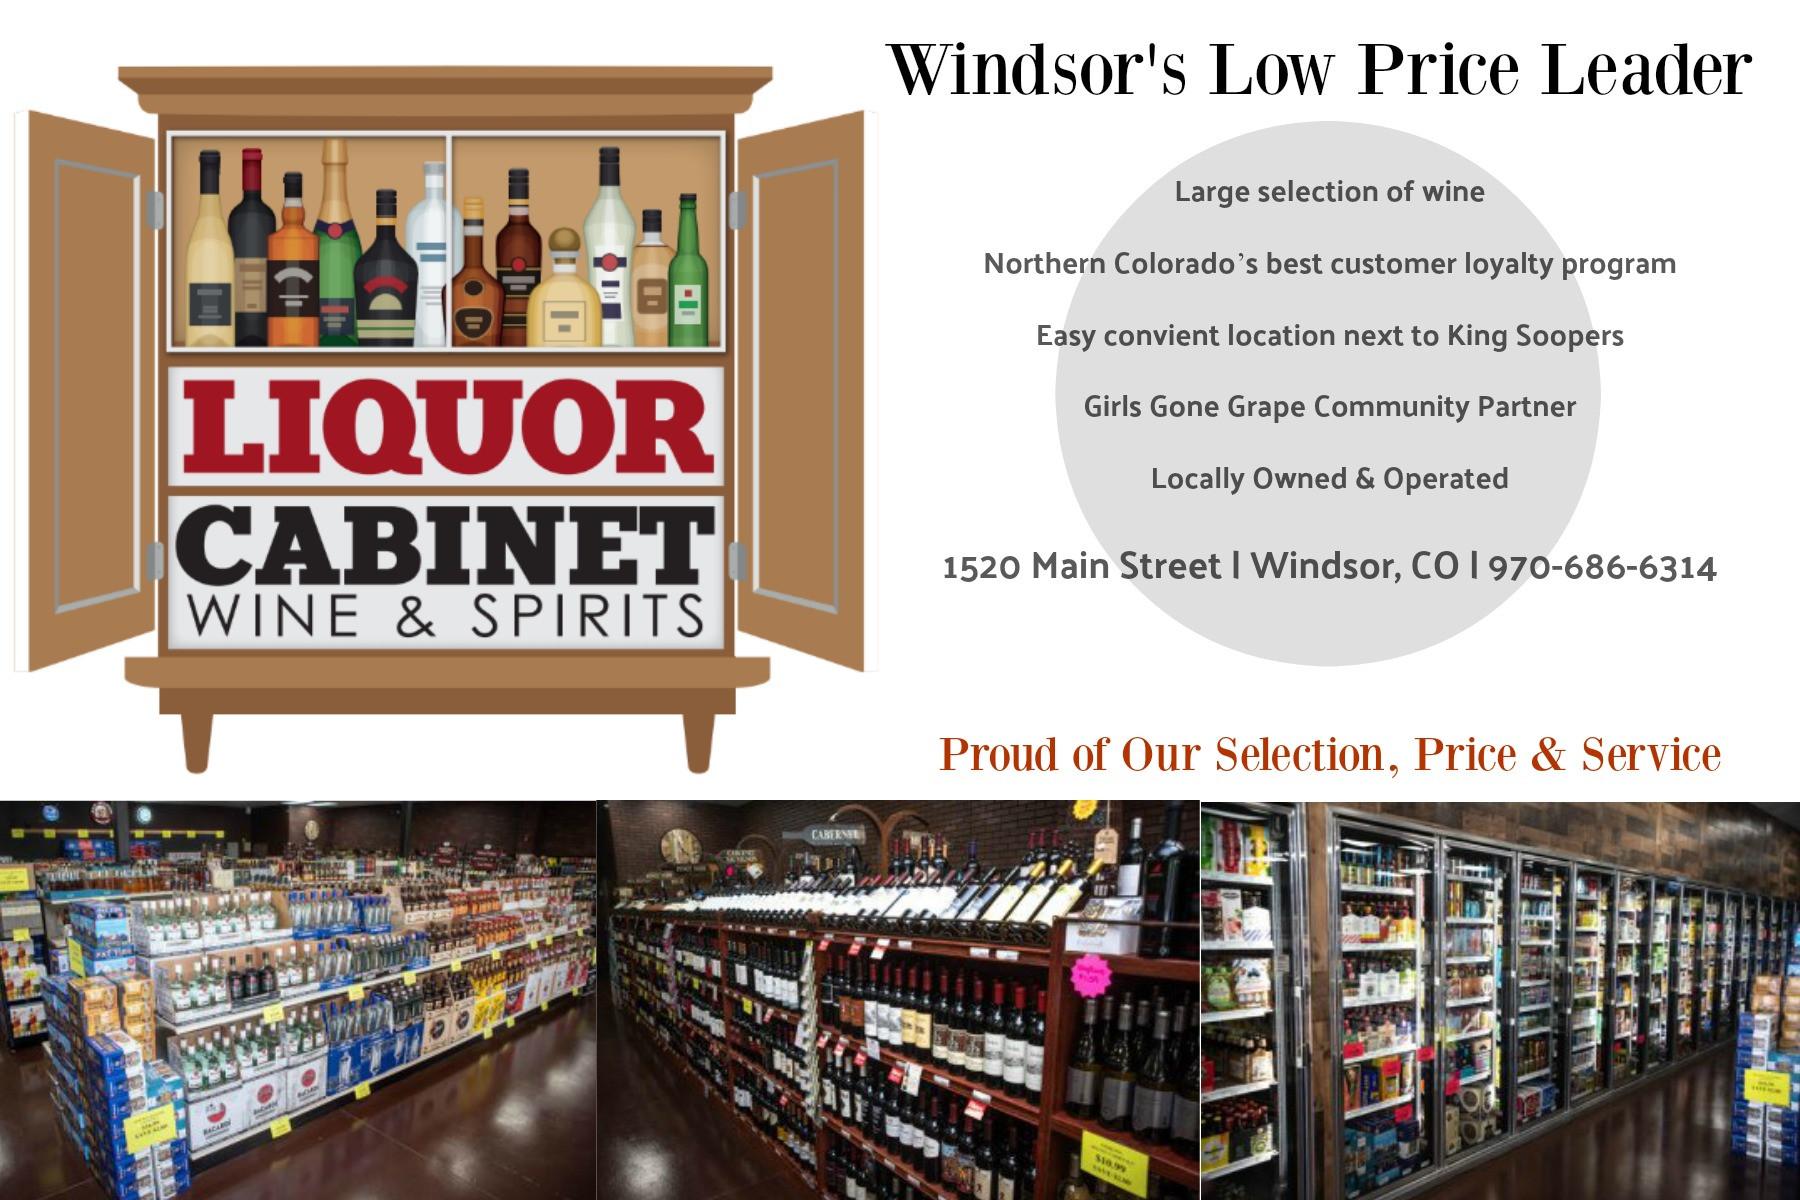 CO-Liquor Cabinet Wine & Spirits